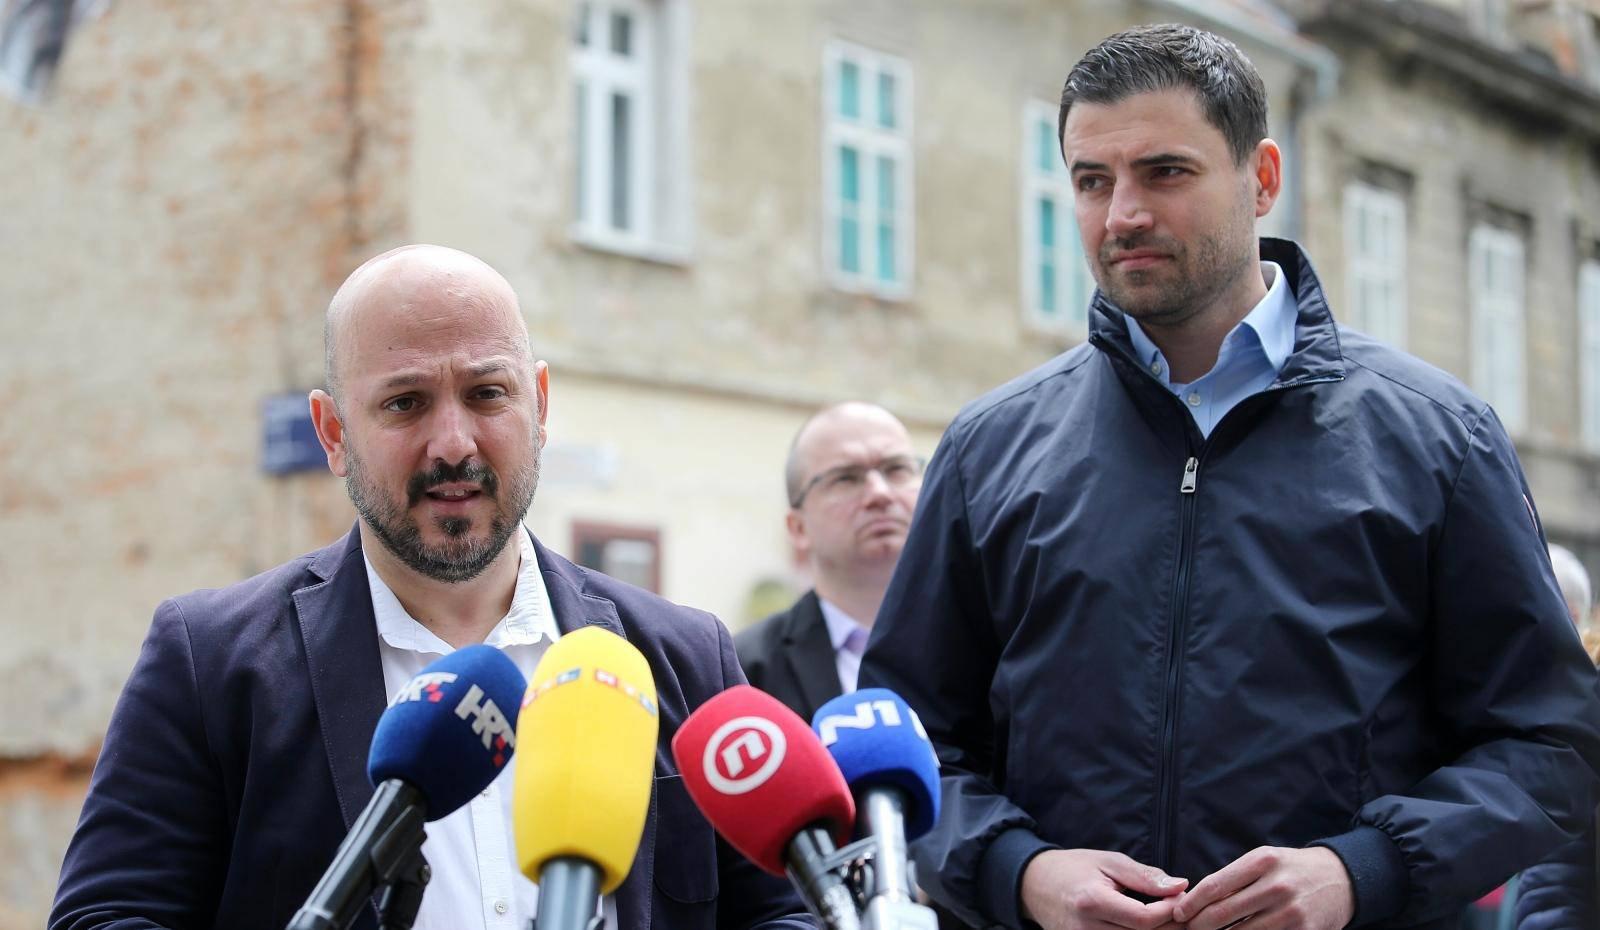 Zagreb: U povodu Dana Grada Zagreba medijima se obratili Gordan Maras i Davor Bernardić